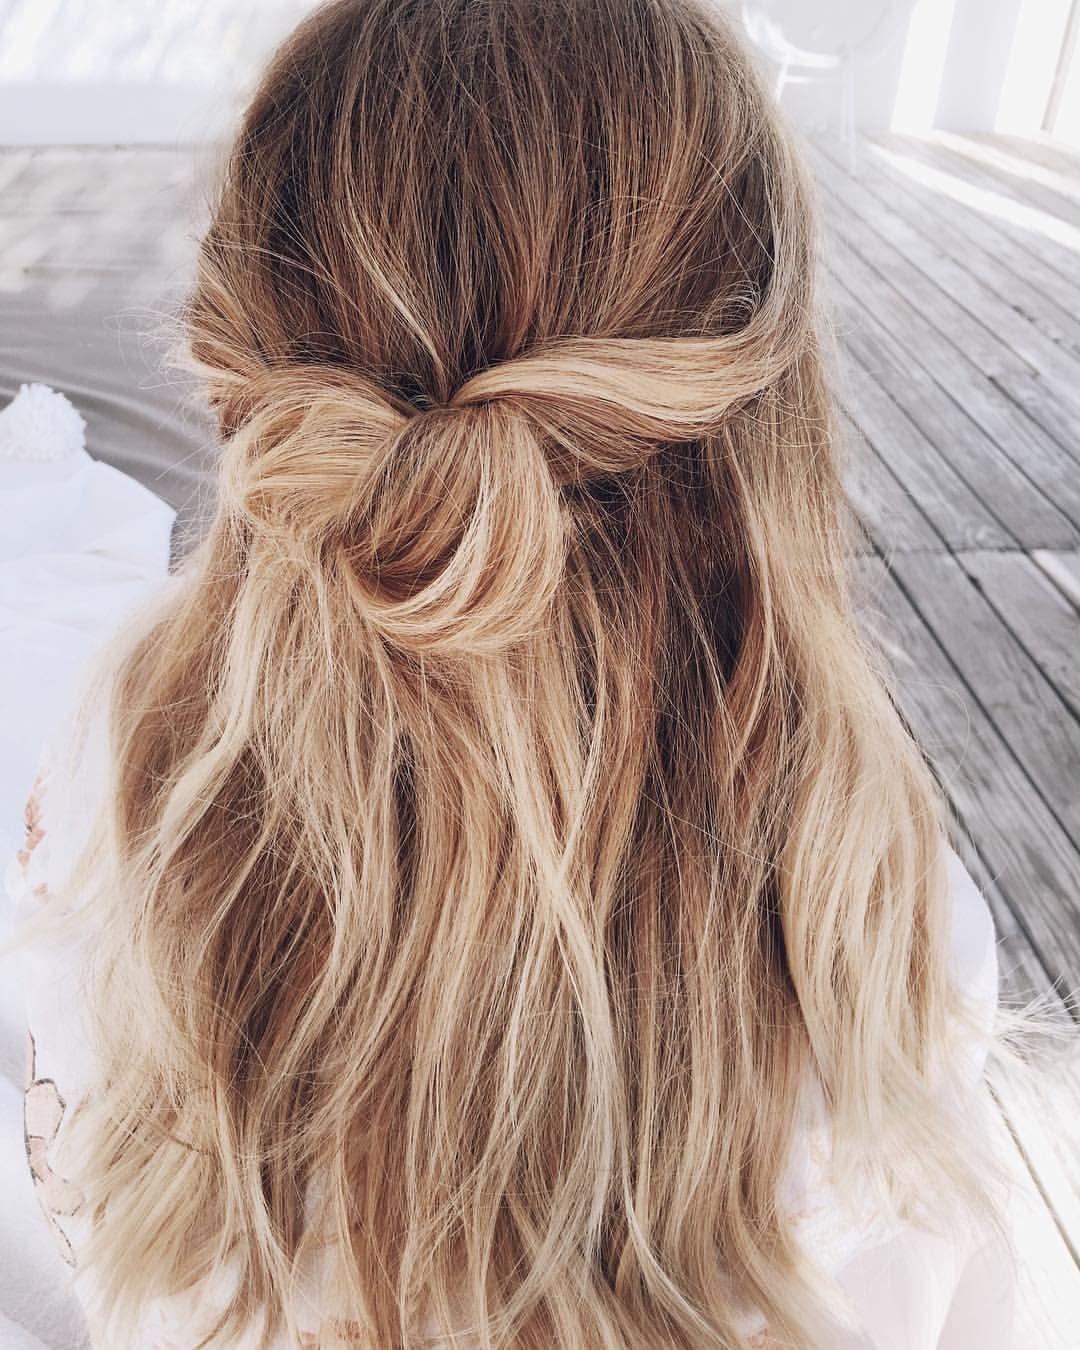 Lauren conrad kohls half up twisted sitch hair dous u beauty